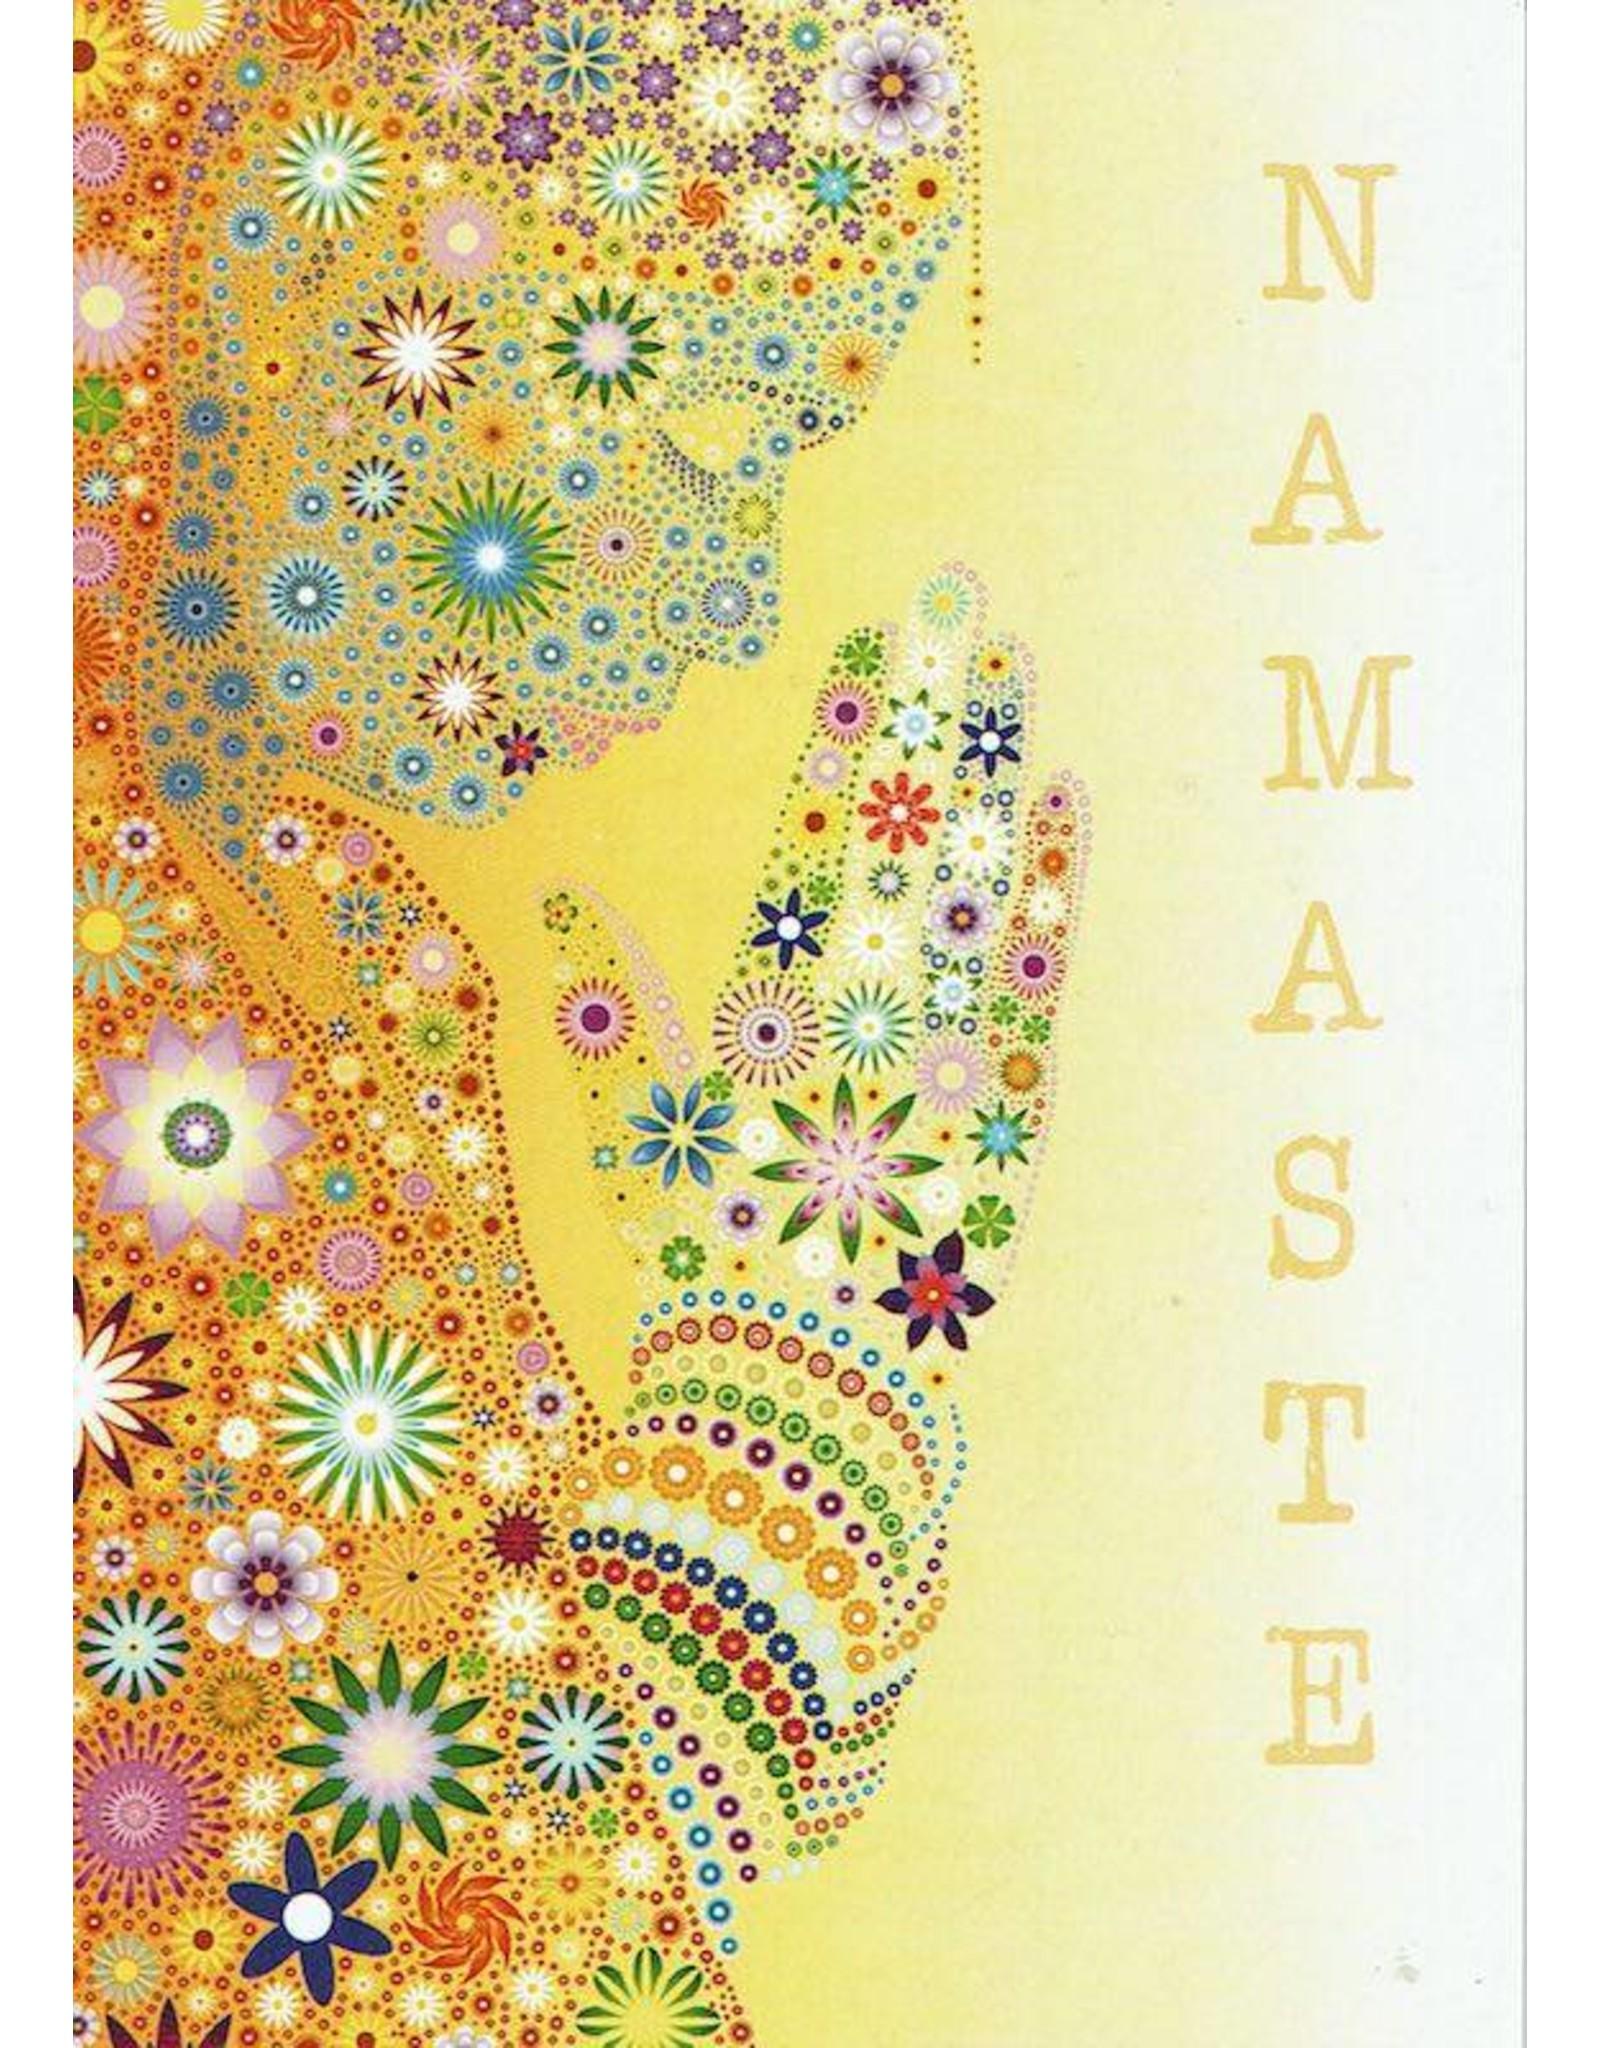 ZintenZ postcard Namasté